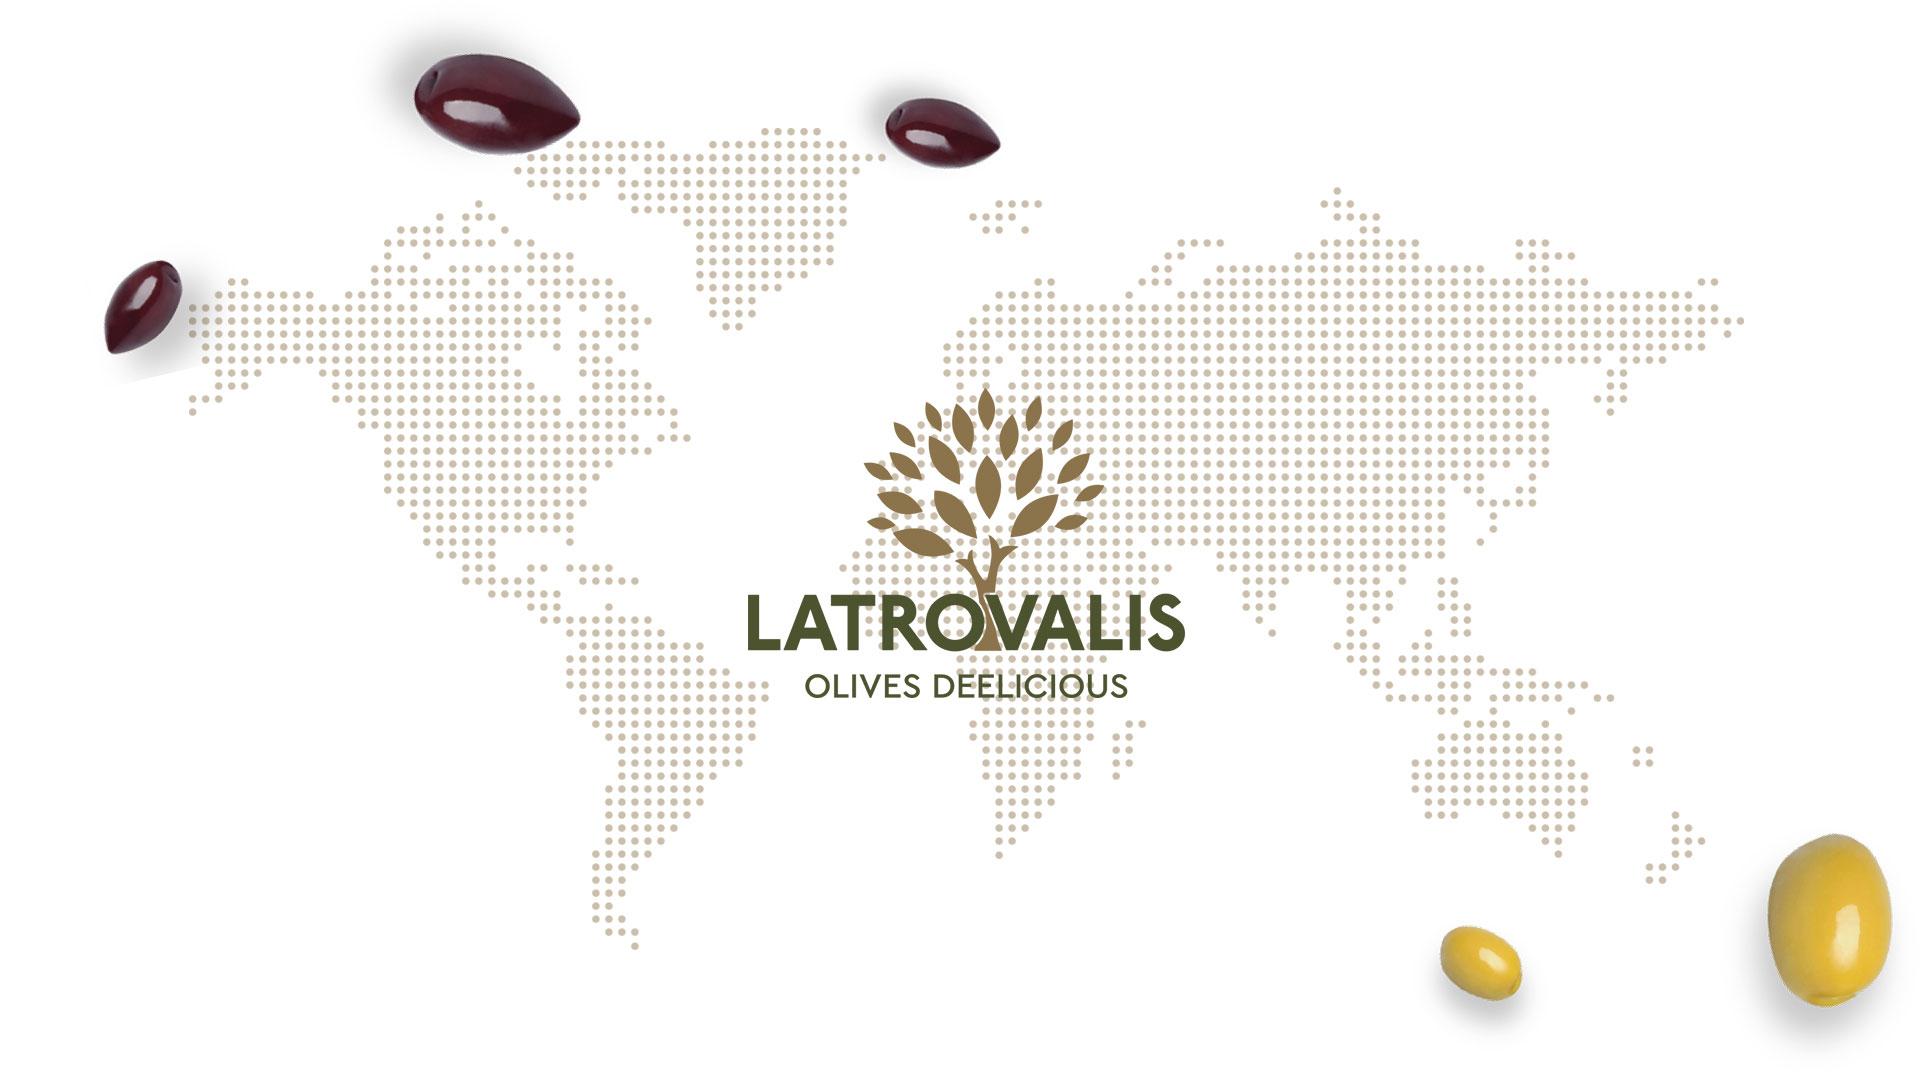 exports-latrovalis-img